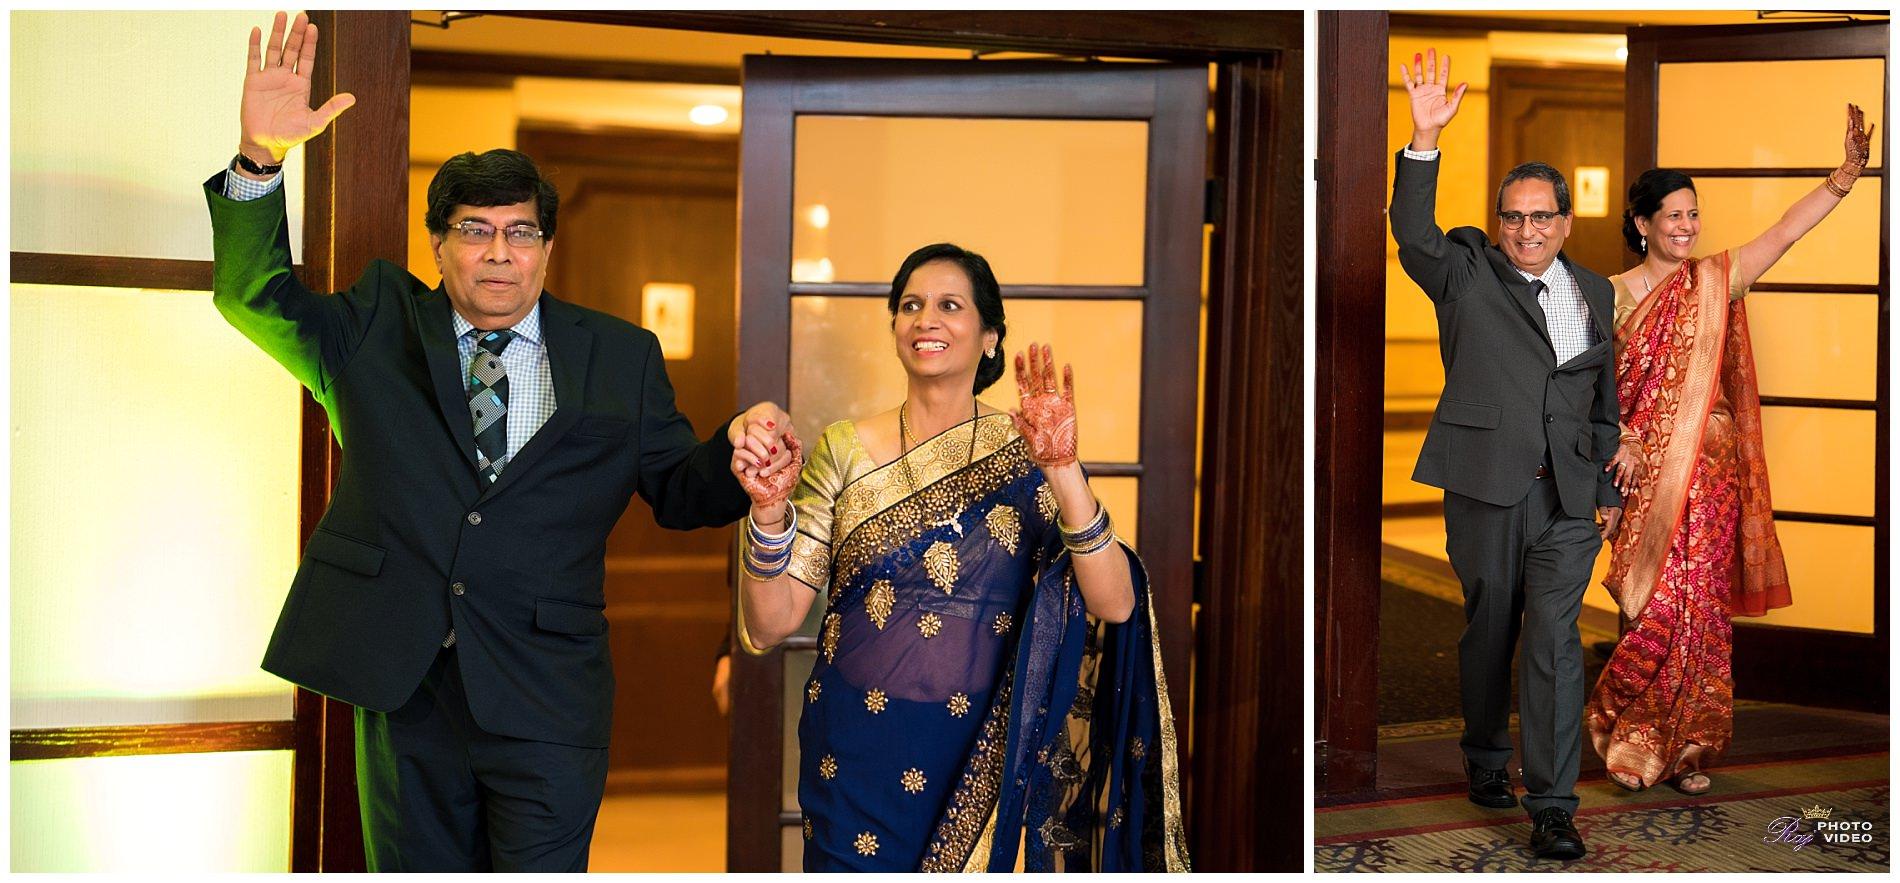 Martinsville-Gardens-NJ-Indian-Wedding-Ruchi-Vishal-52.jpg